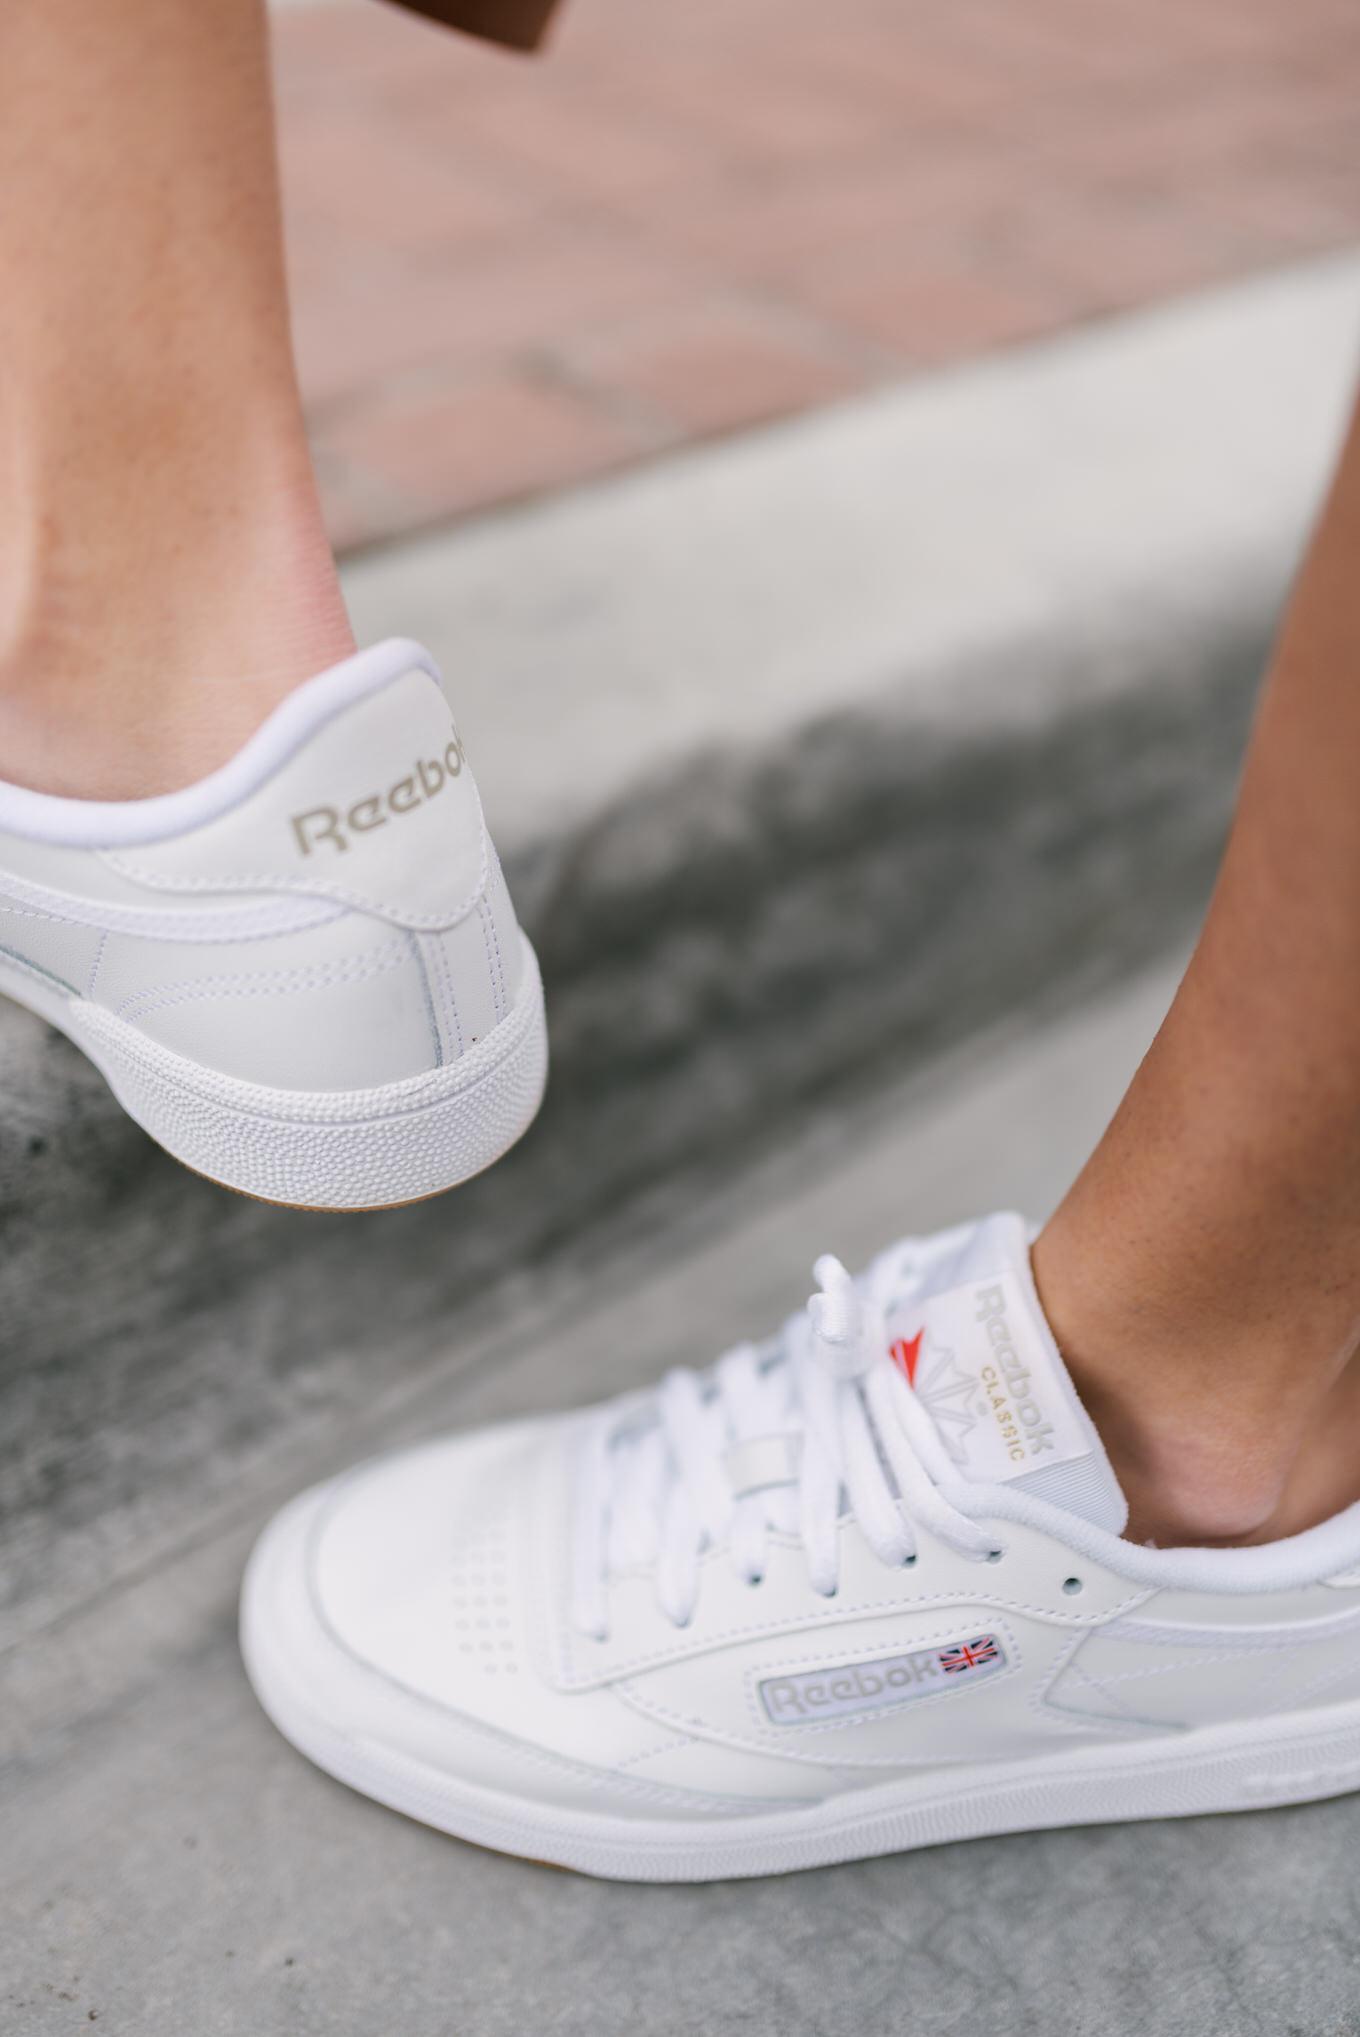 classic reebok sneakers